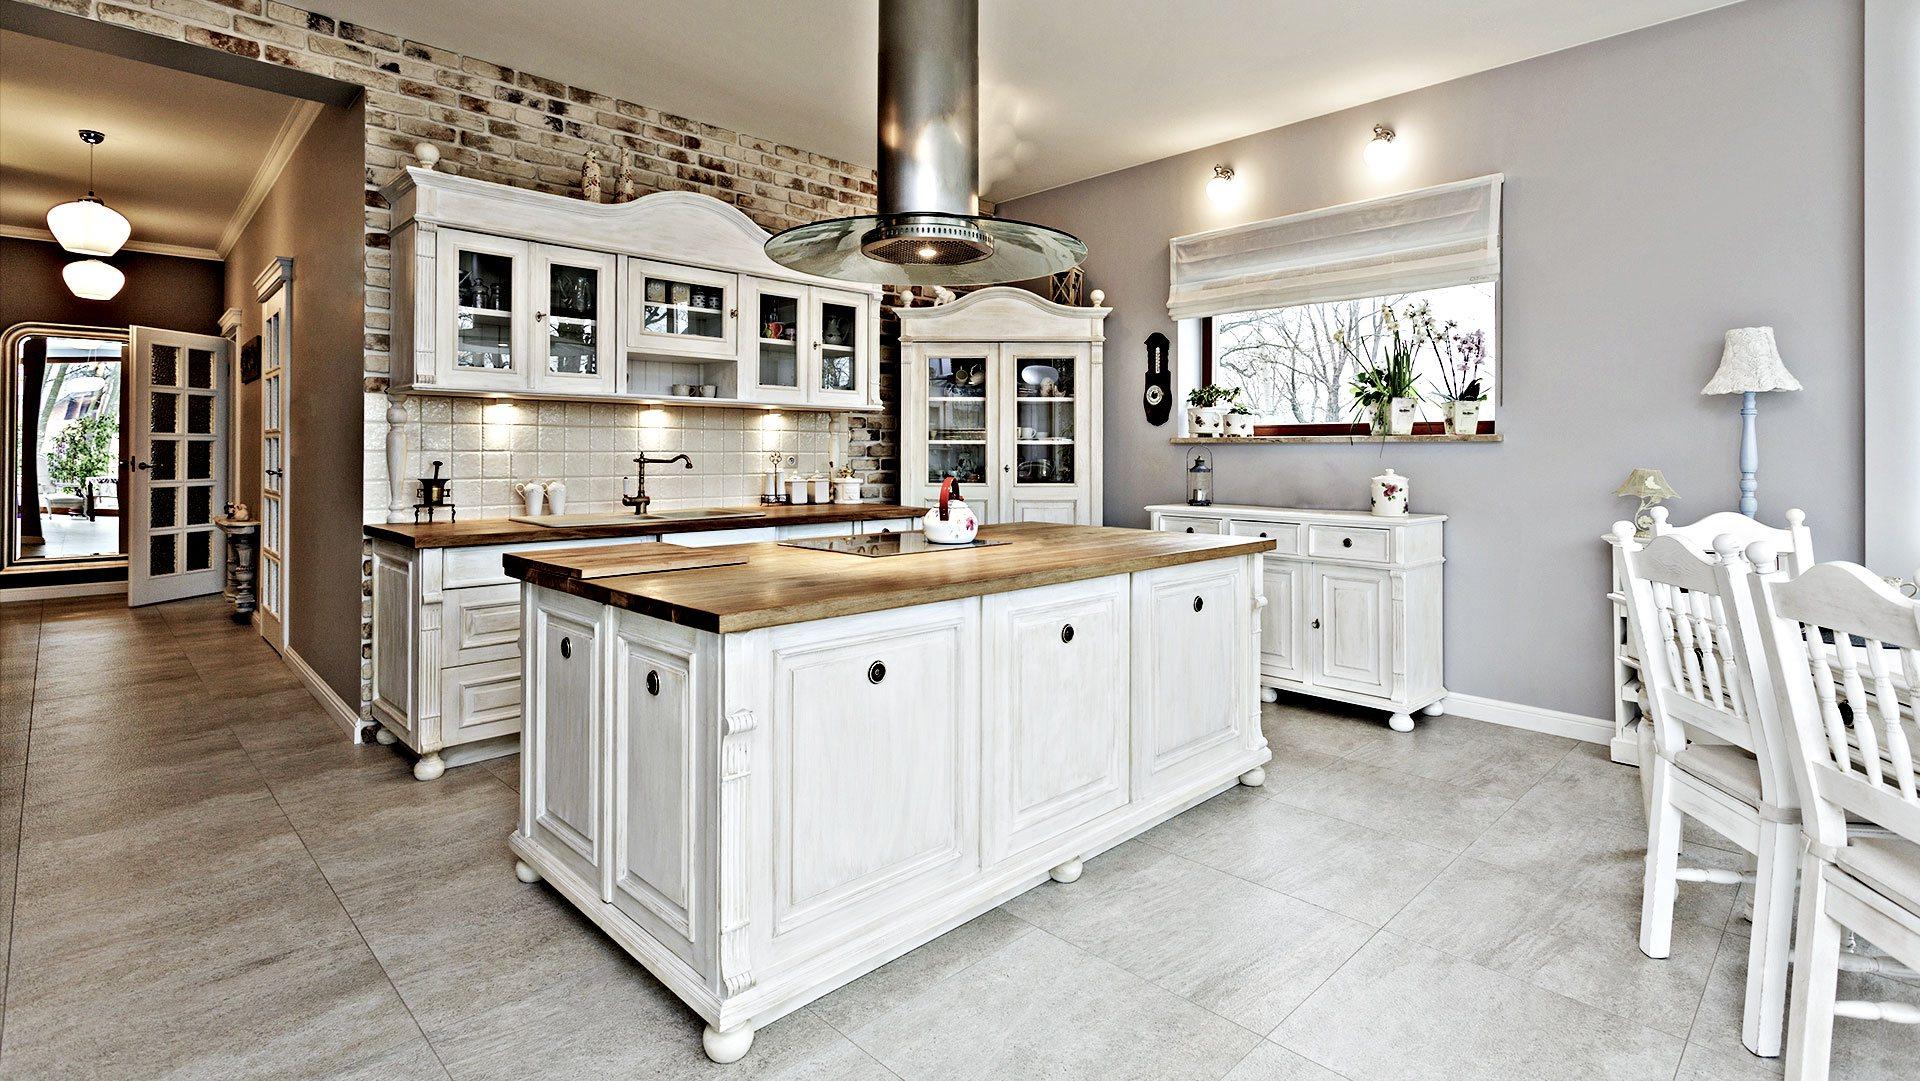 RK Construction Group LLC Remodeled Kitchen 2